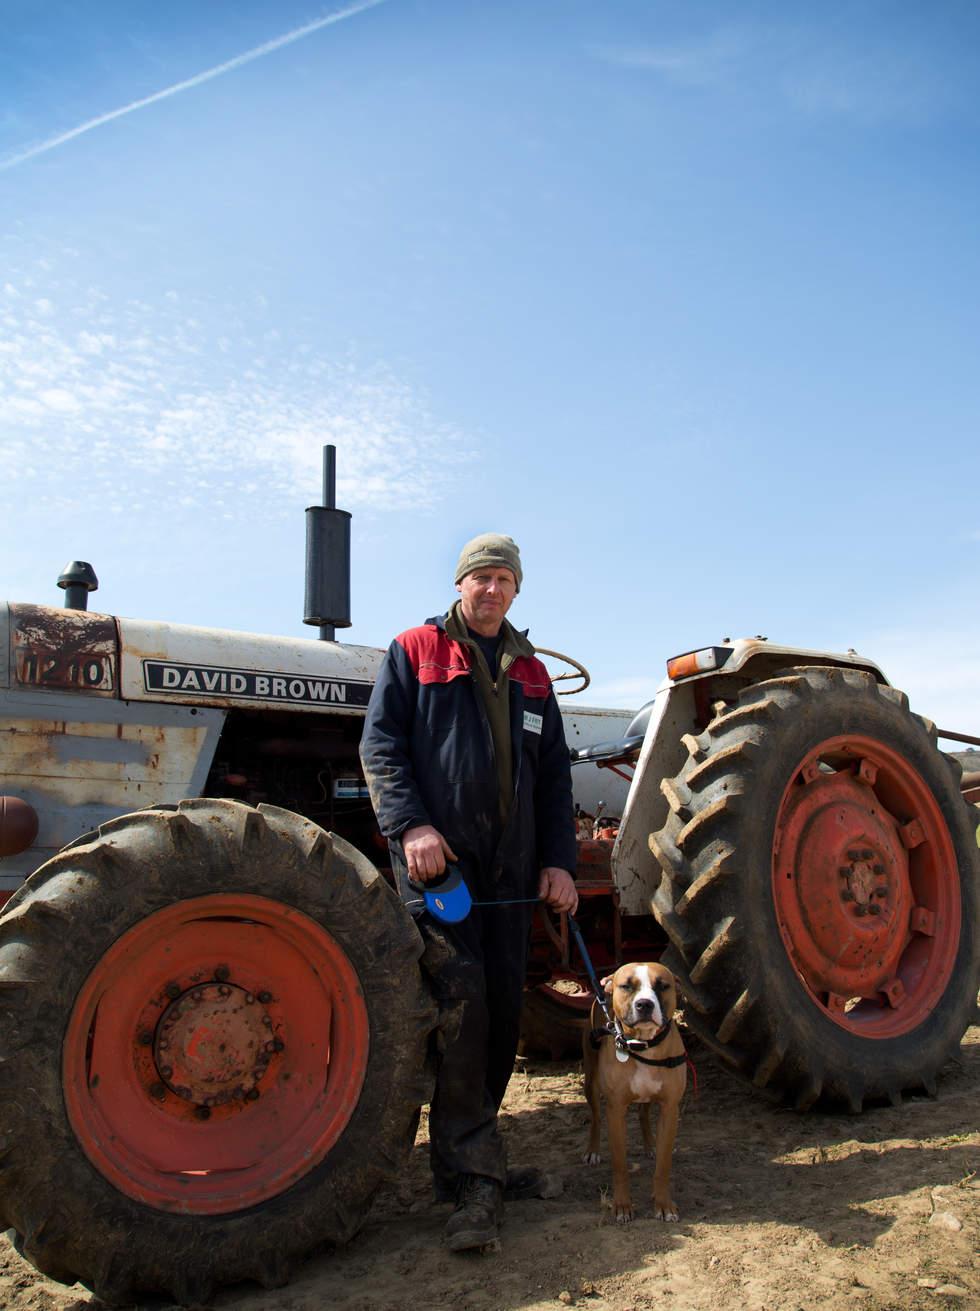 Greg Smith & Ernie the dog